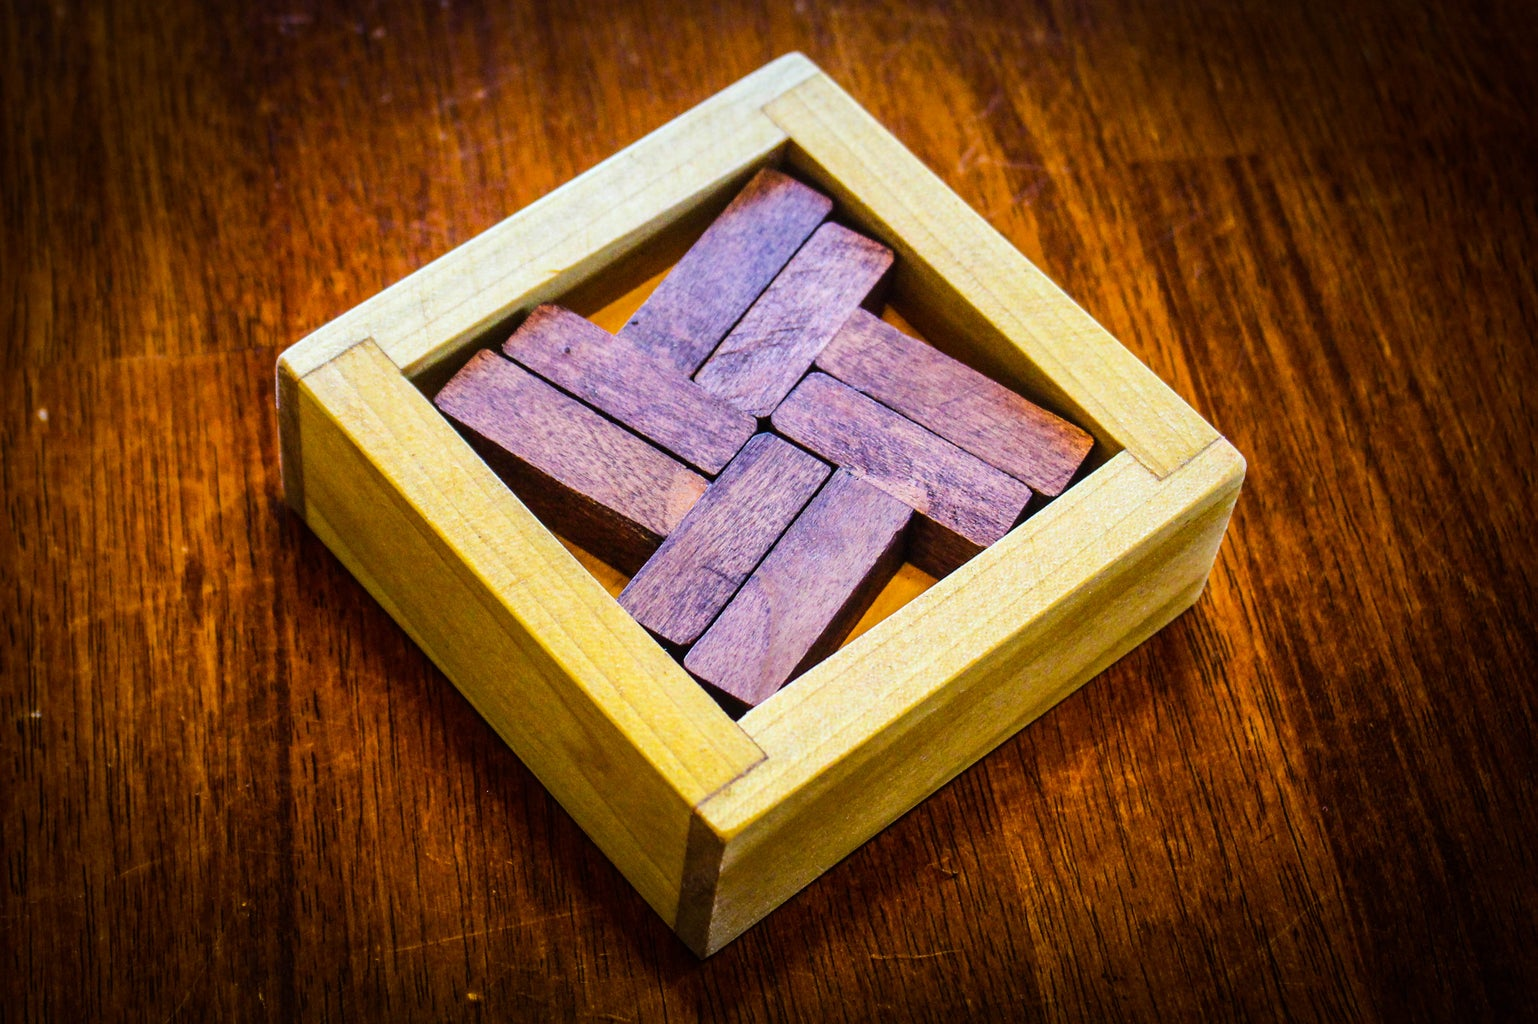 Final Pictures - Puzzle 2